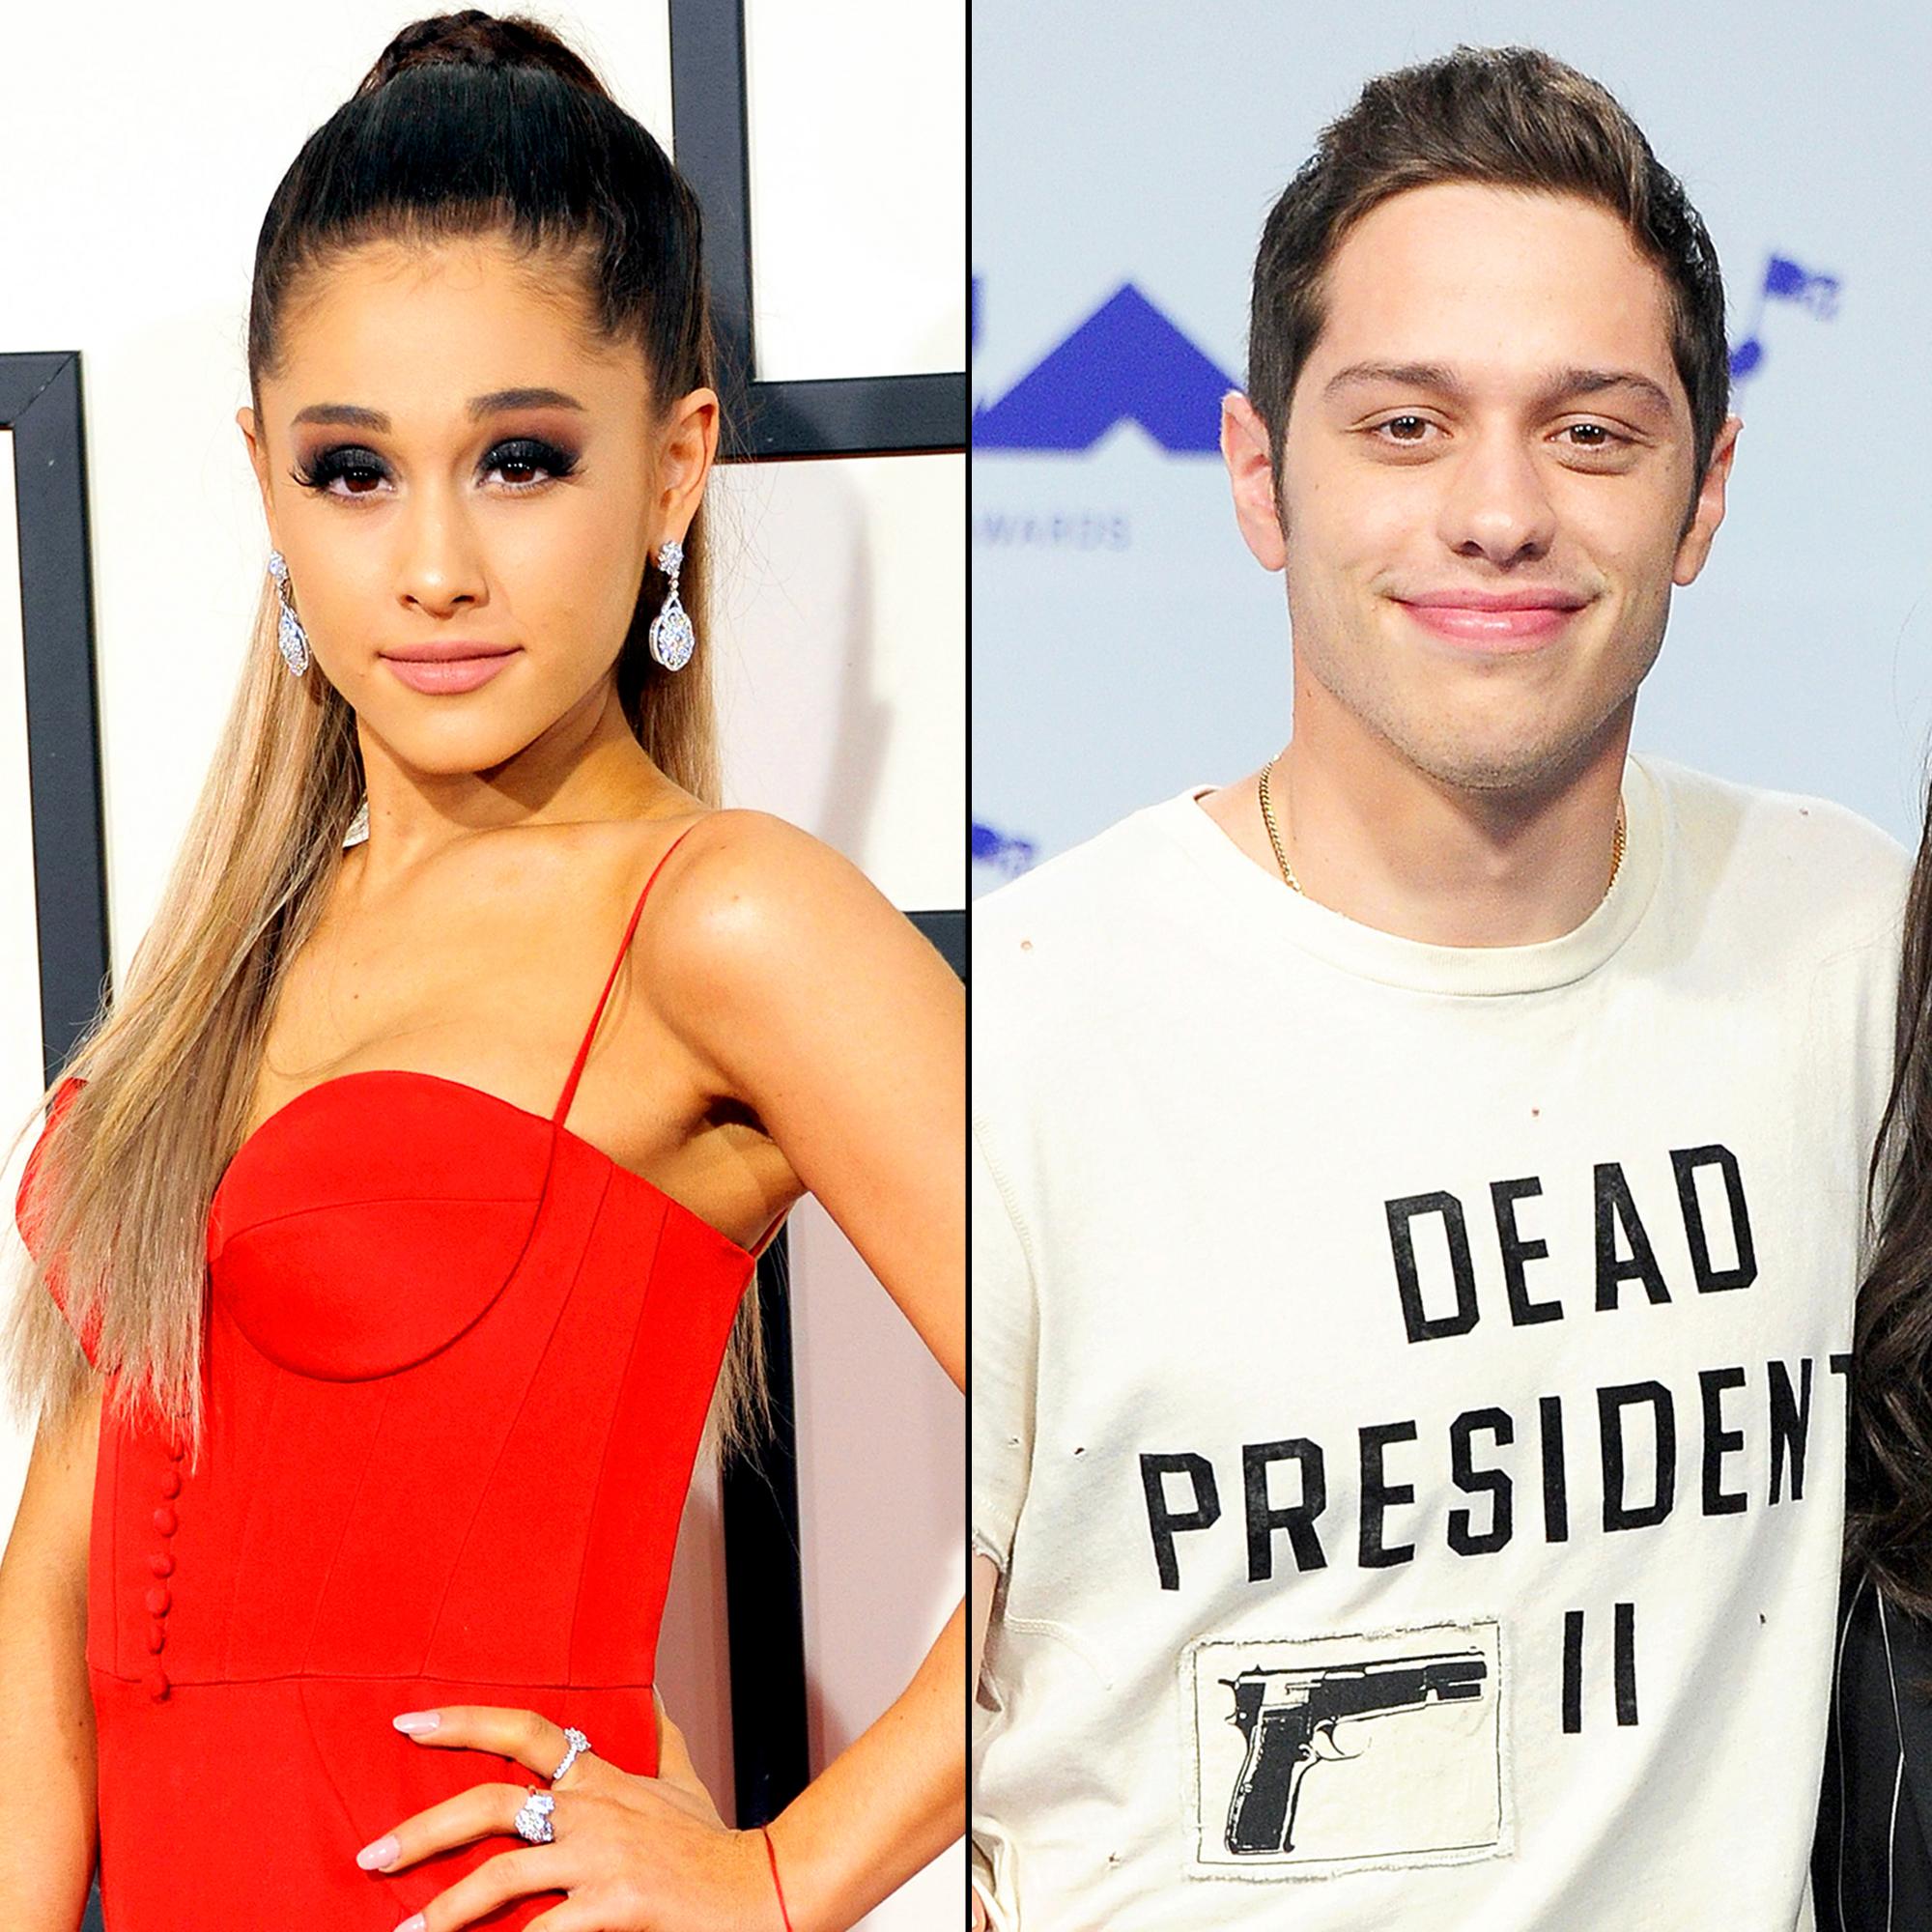 Ho on dating Ariana Grande